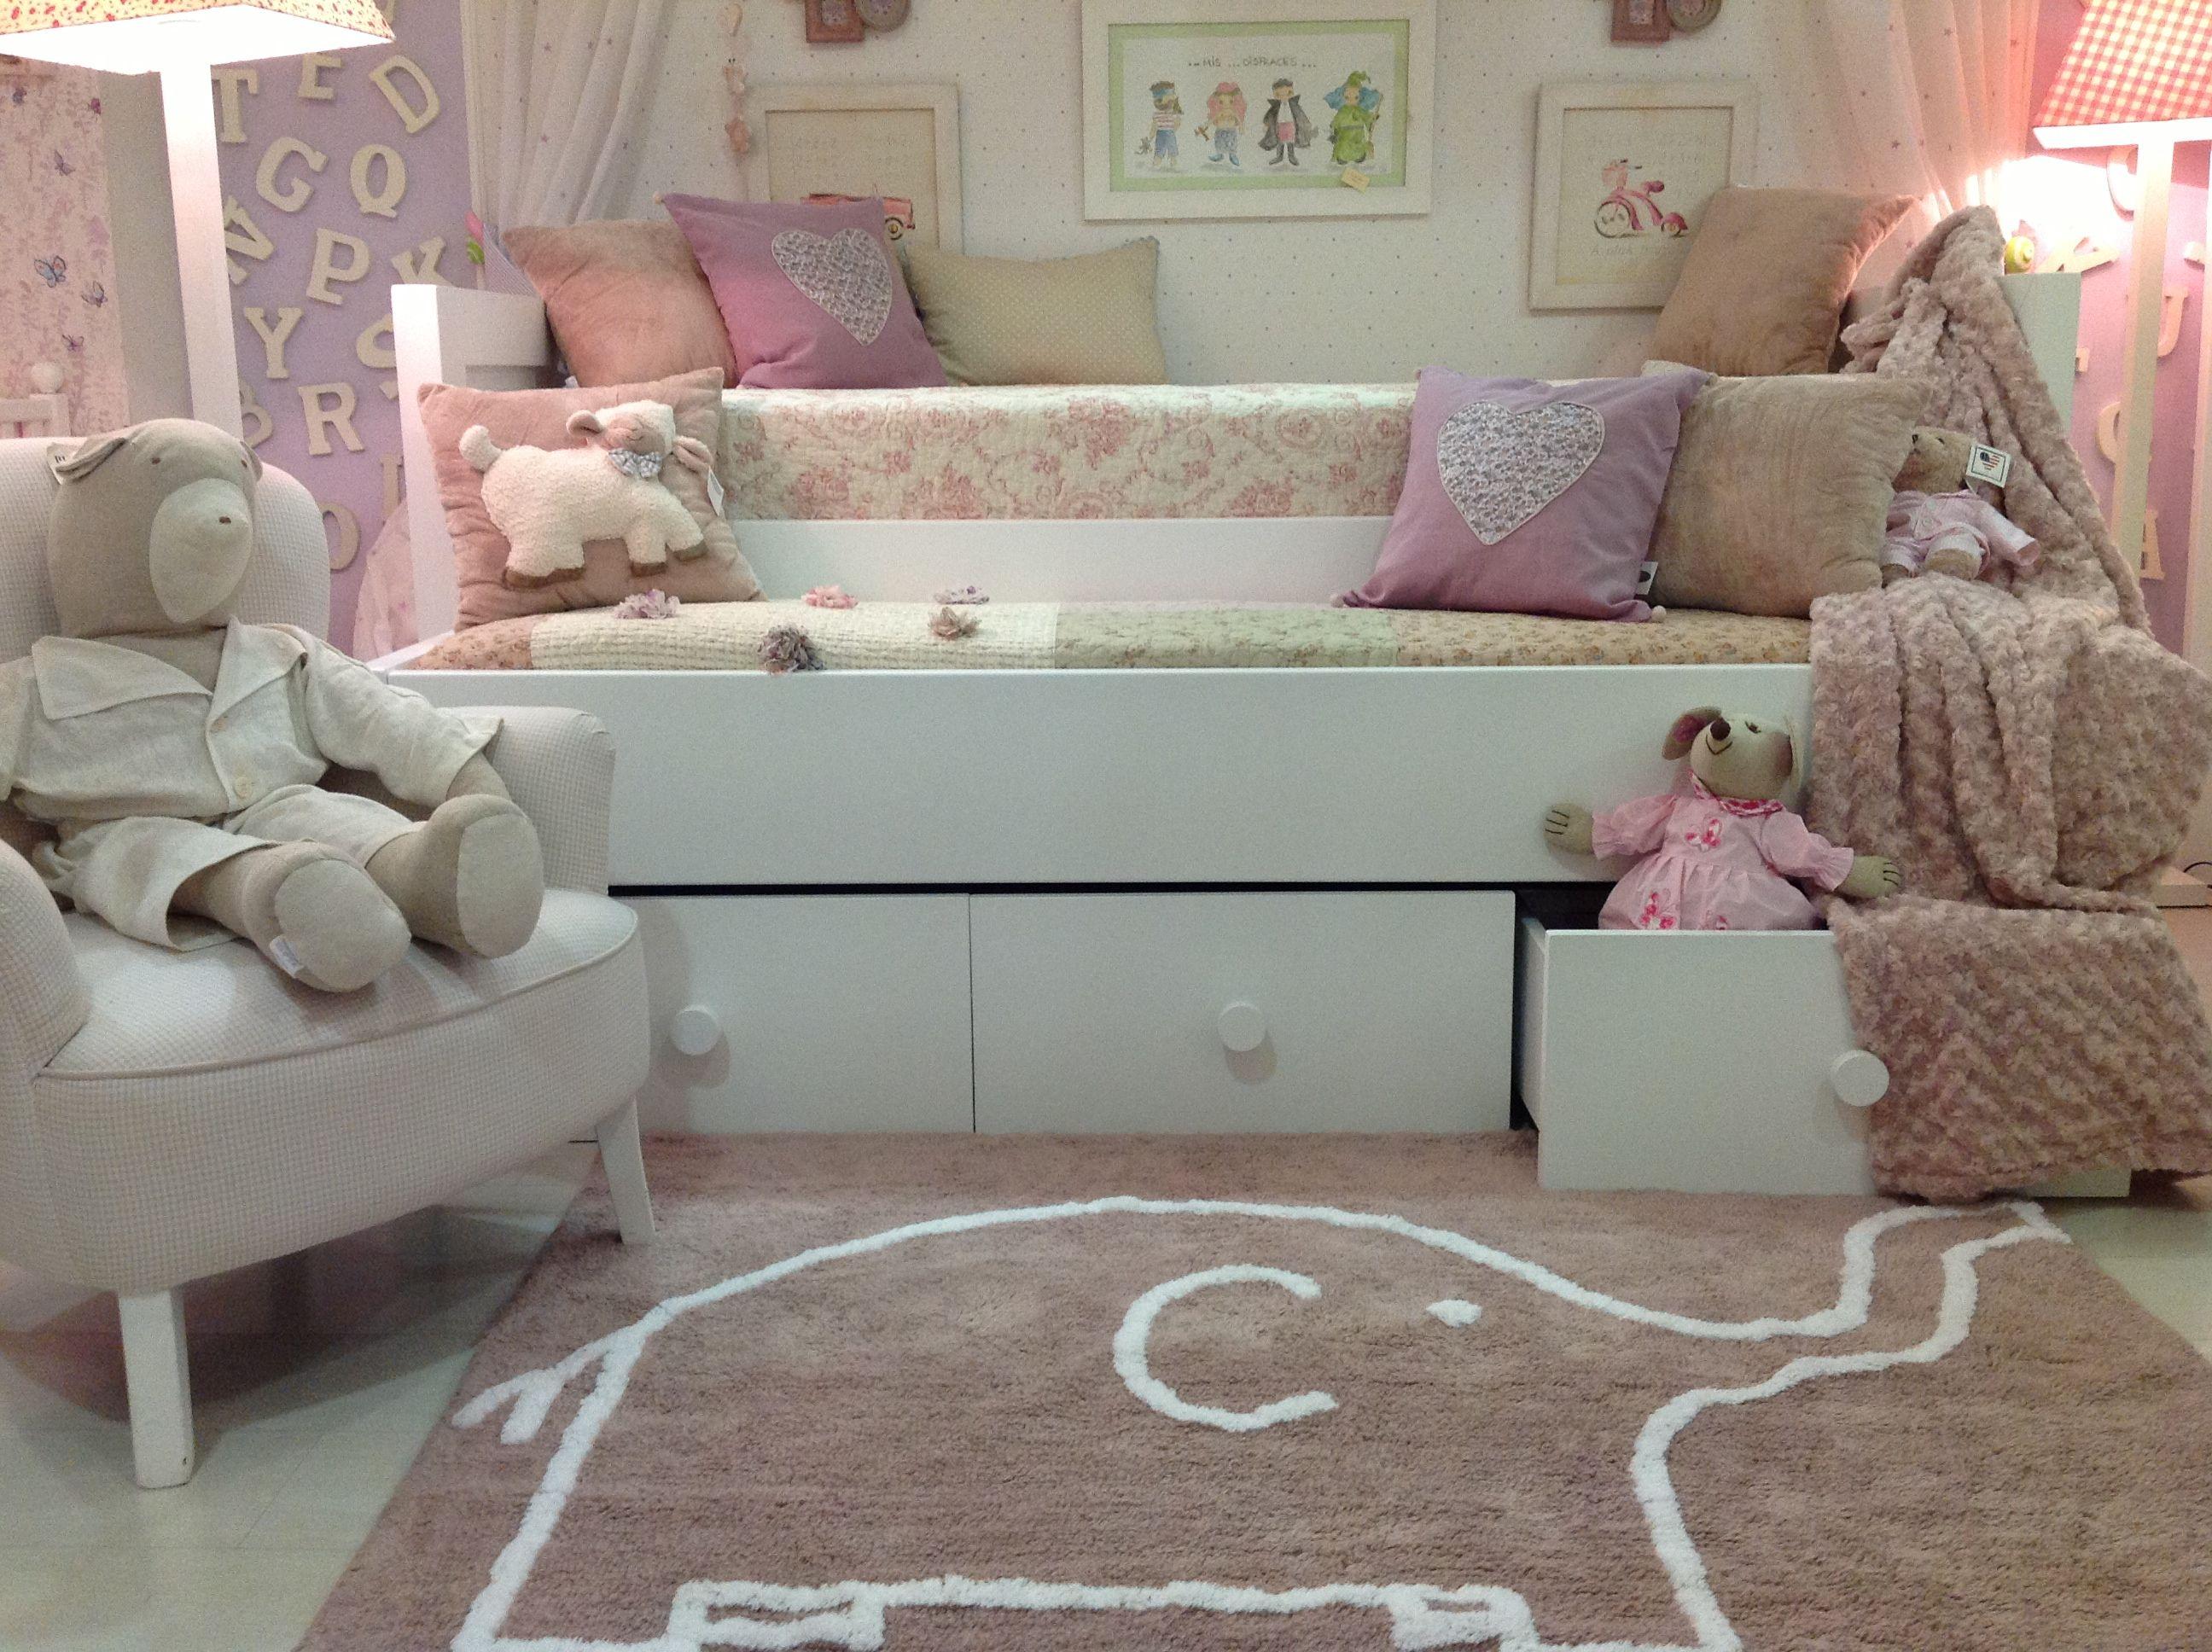 Alfombra elefante en color topo alfombras infantiles lavables en lavadora pinterest - Alfombras infantiles lavables lavadora ...